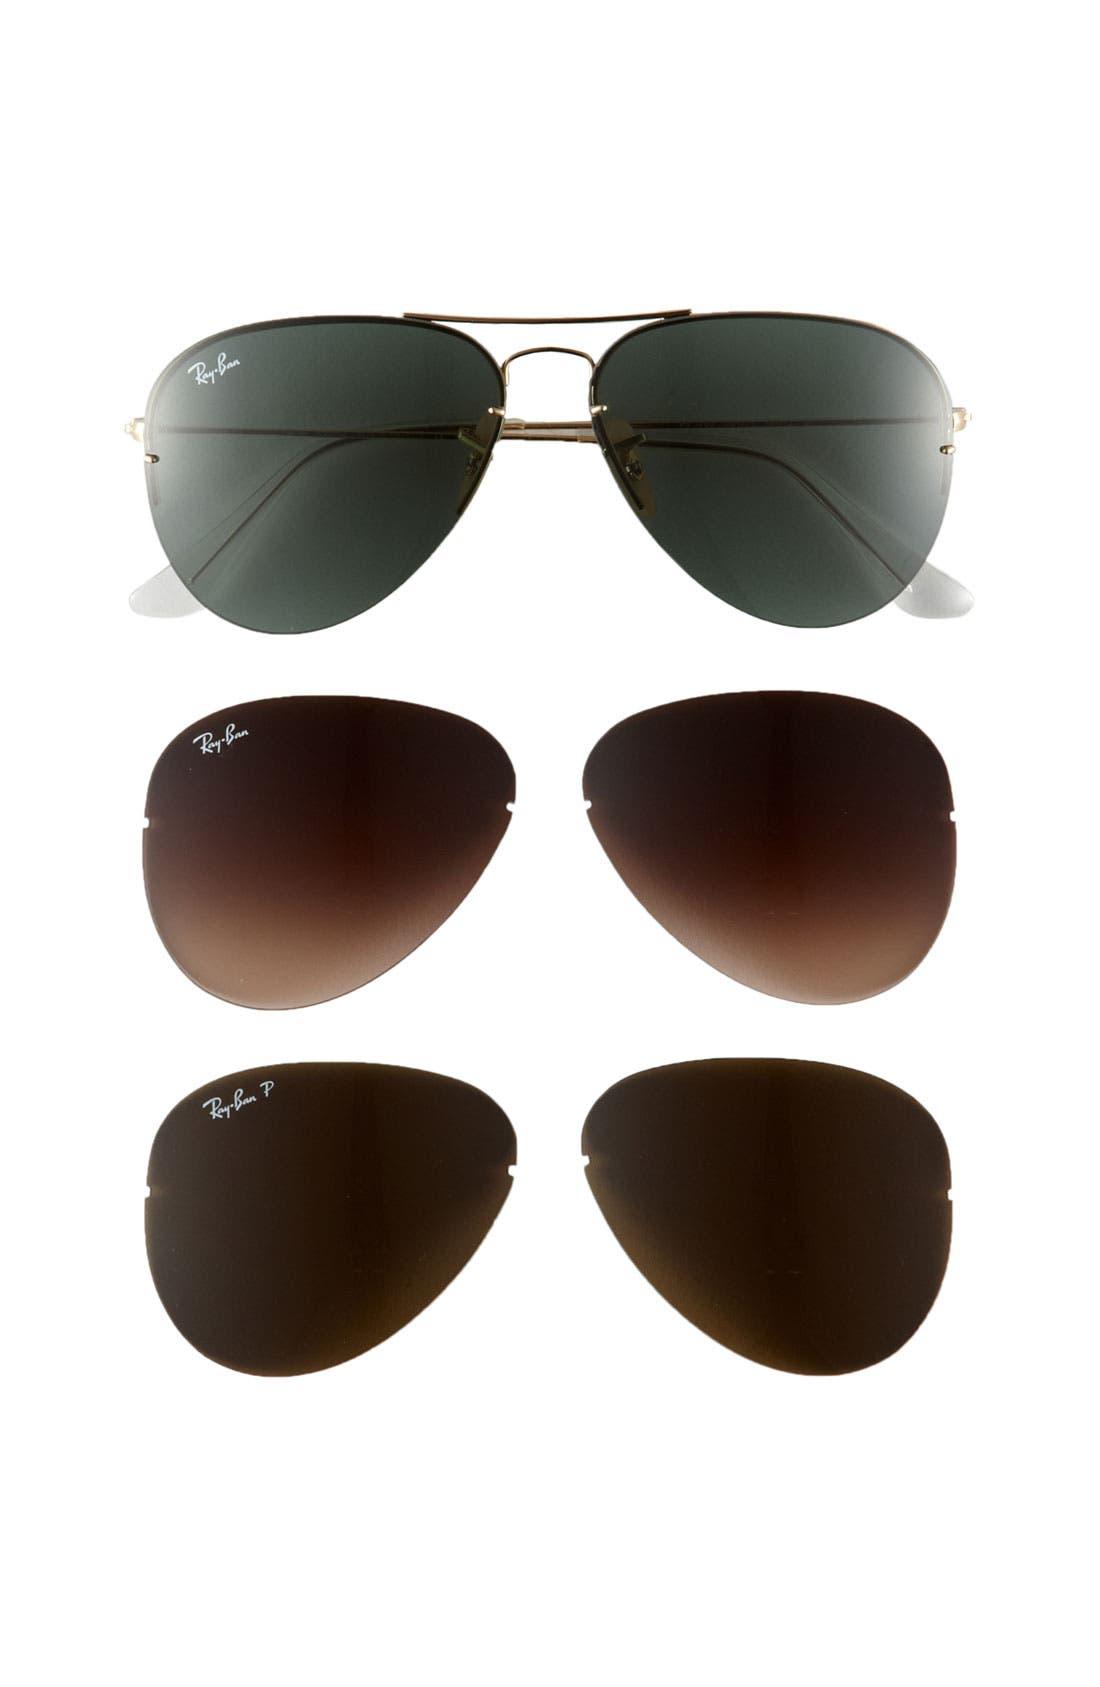 Alternate Image 1 Selected - Ray-Ban 'Light Ray - Interchangeable Lens Box Set' Aviator Sunglasses